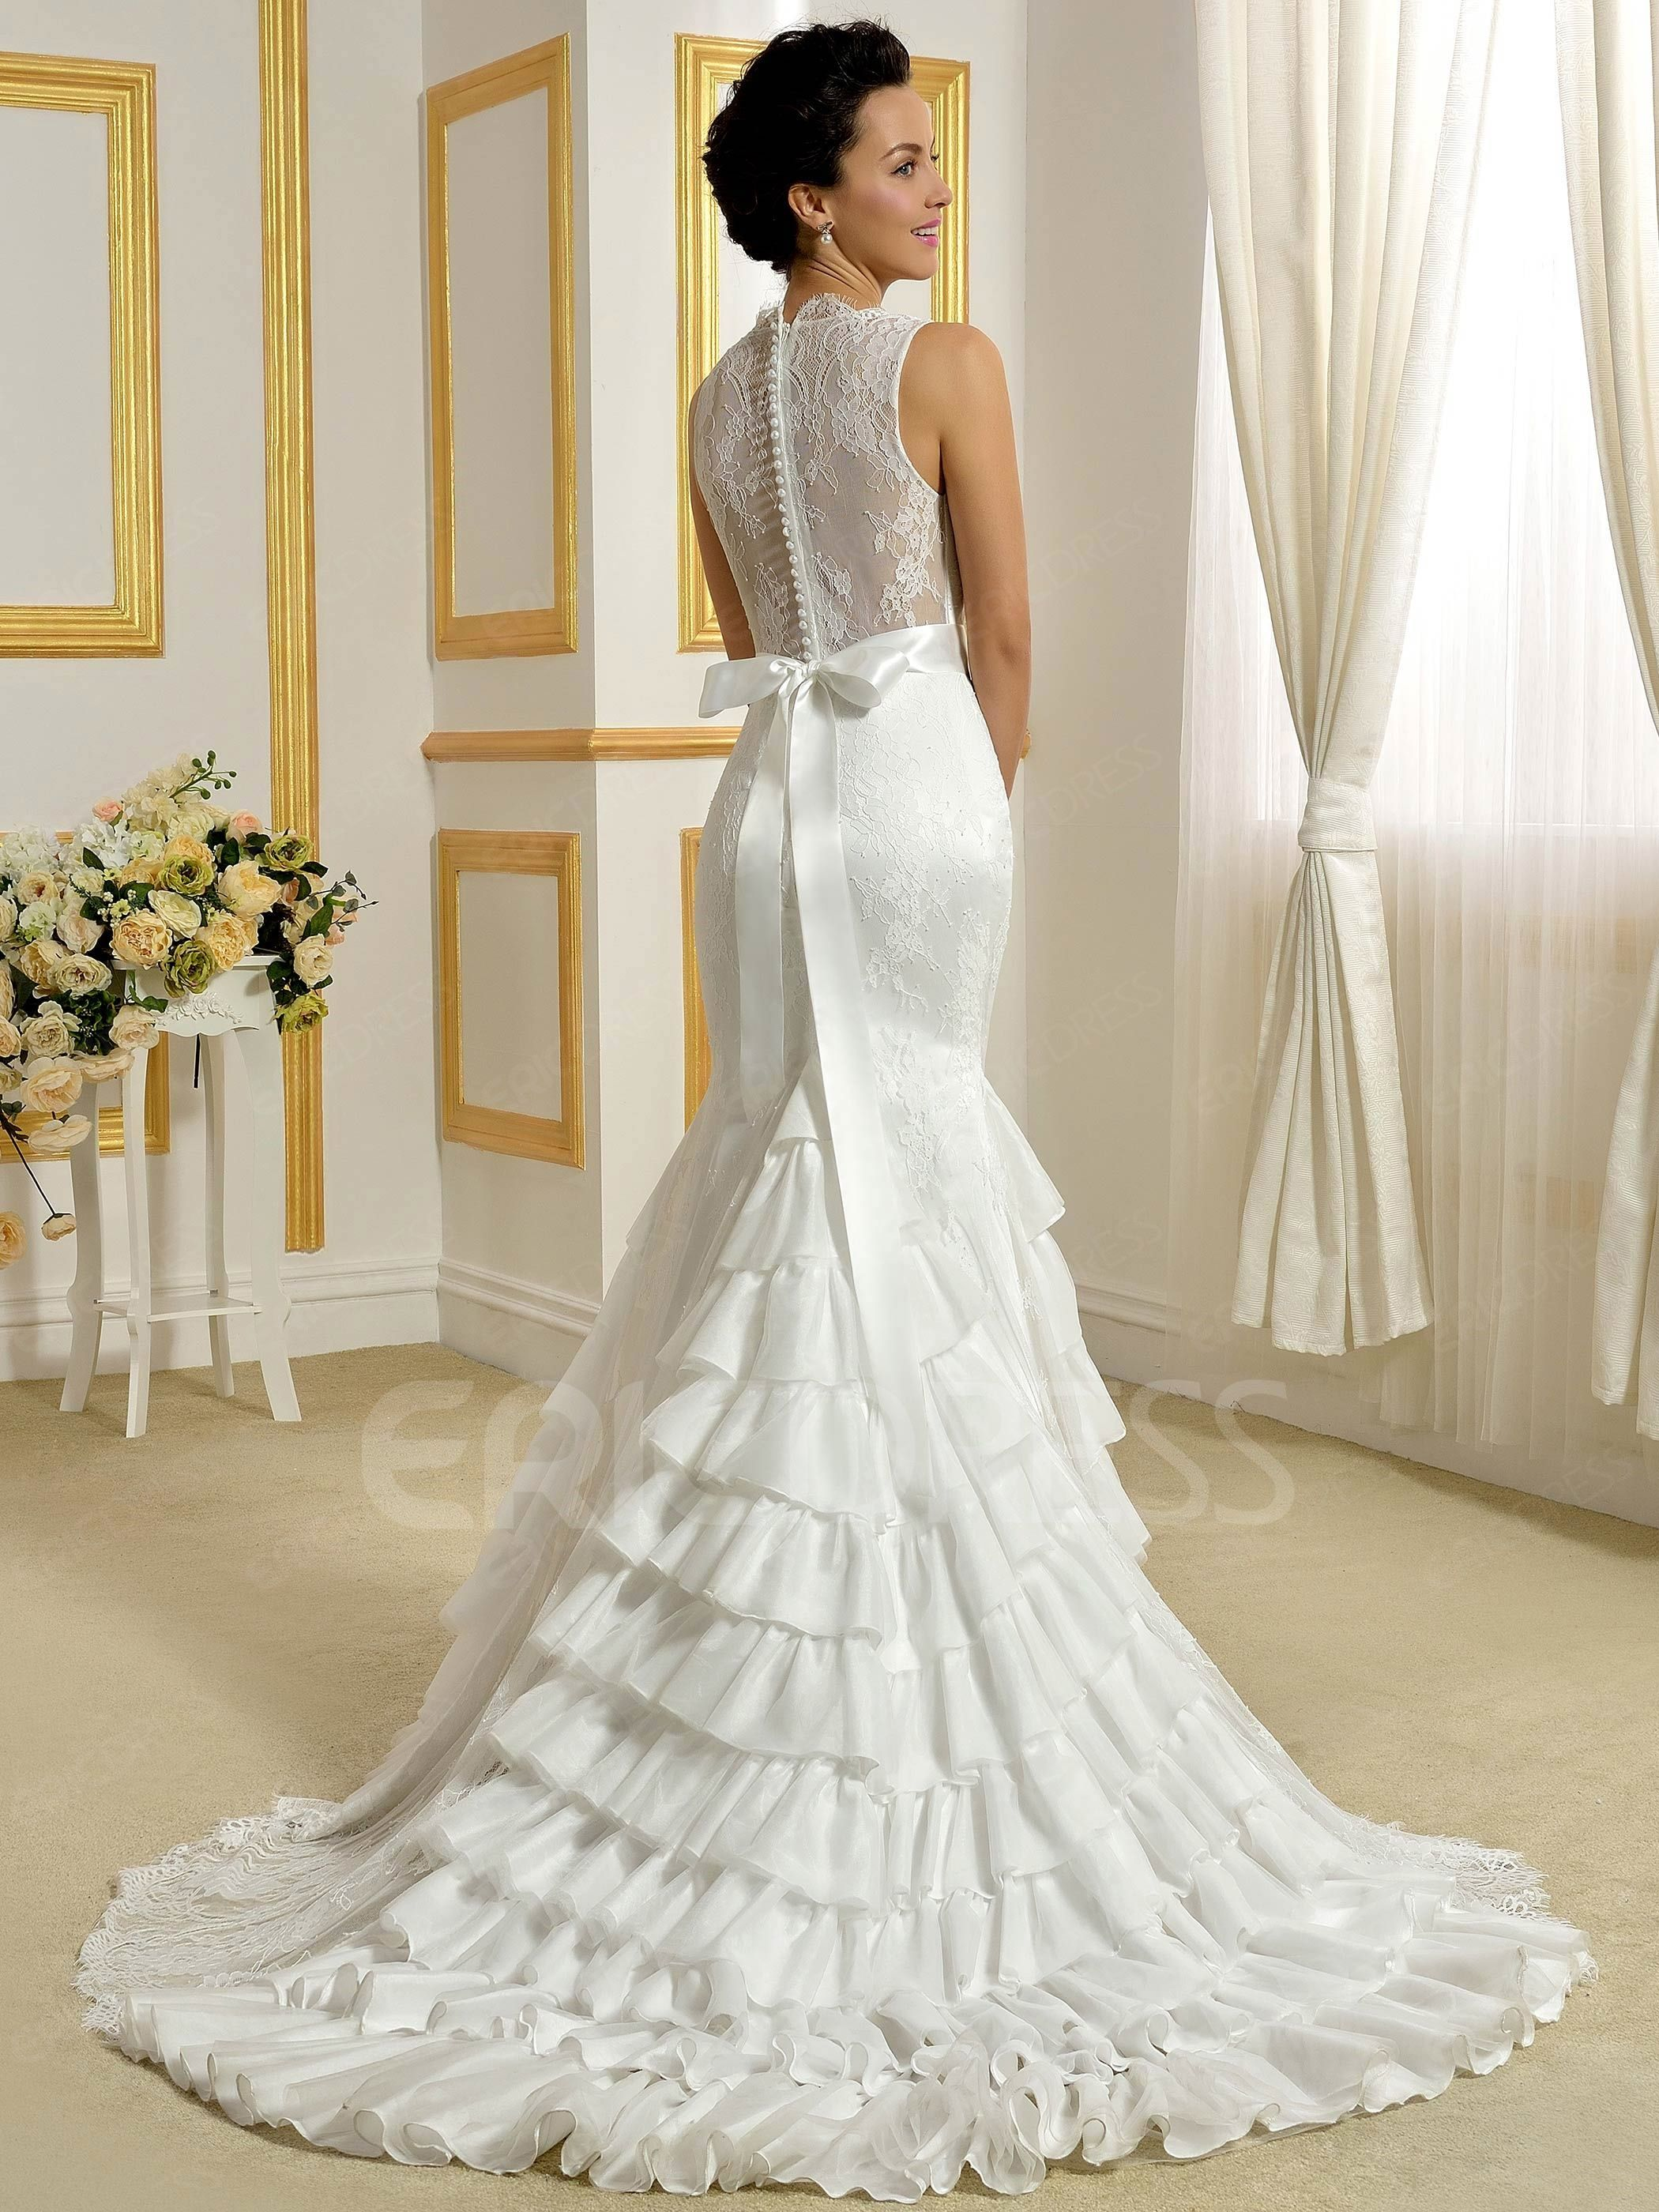 Ericdress fancy lace mermaid wedding dress 2 wedding